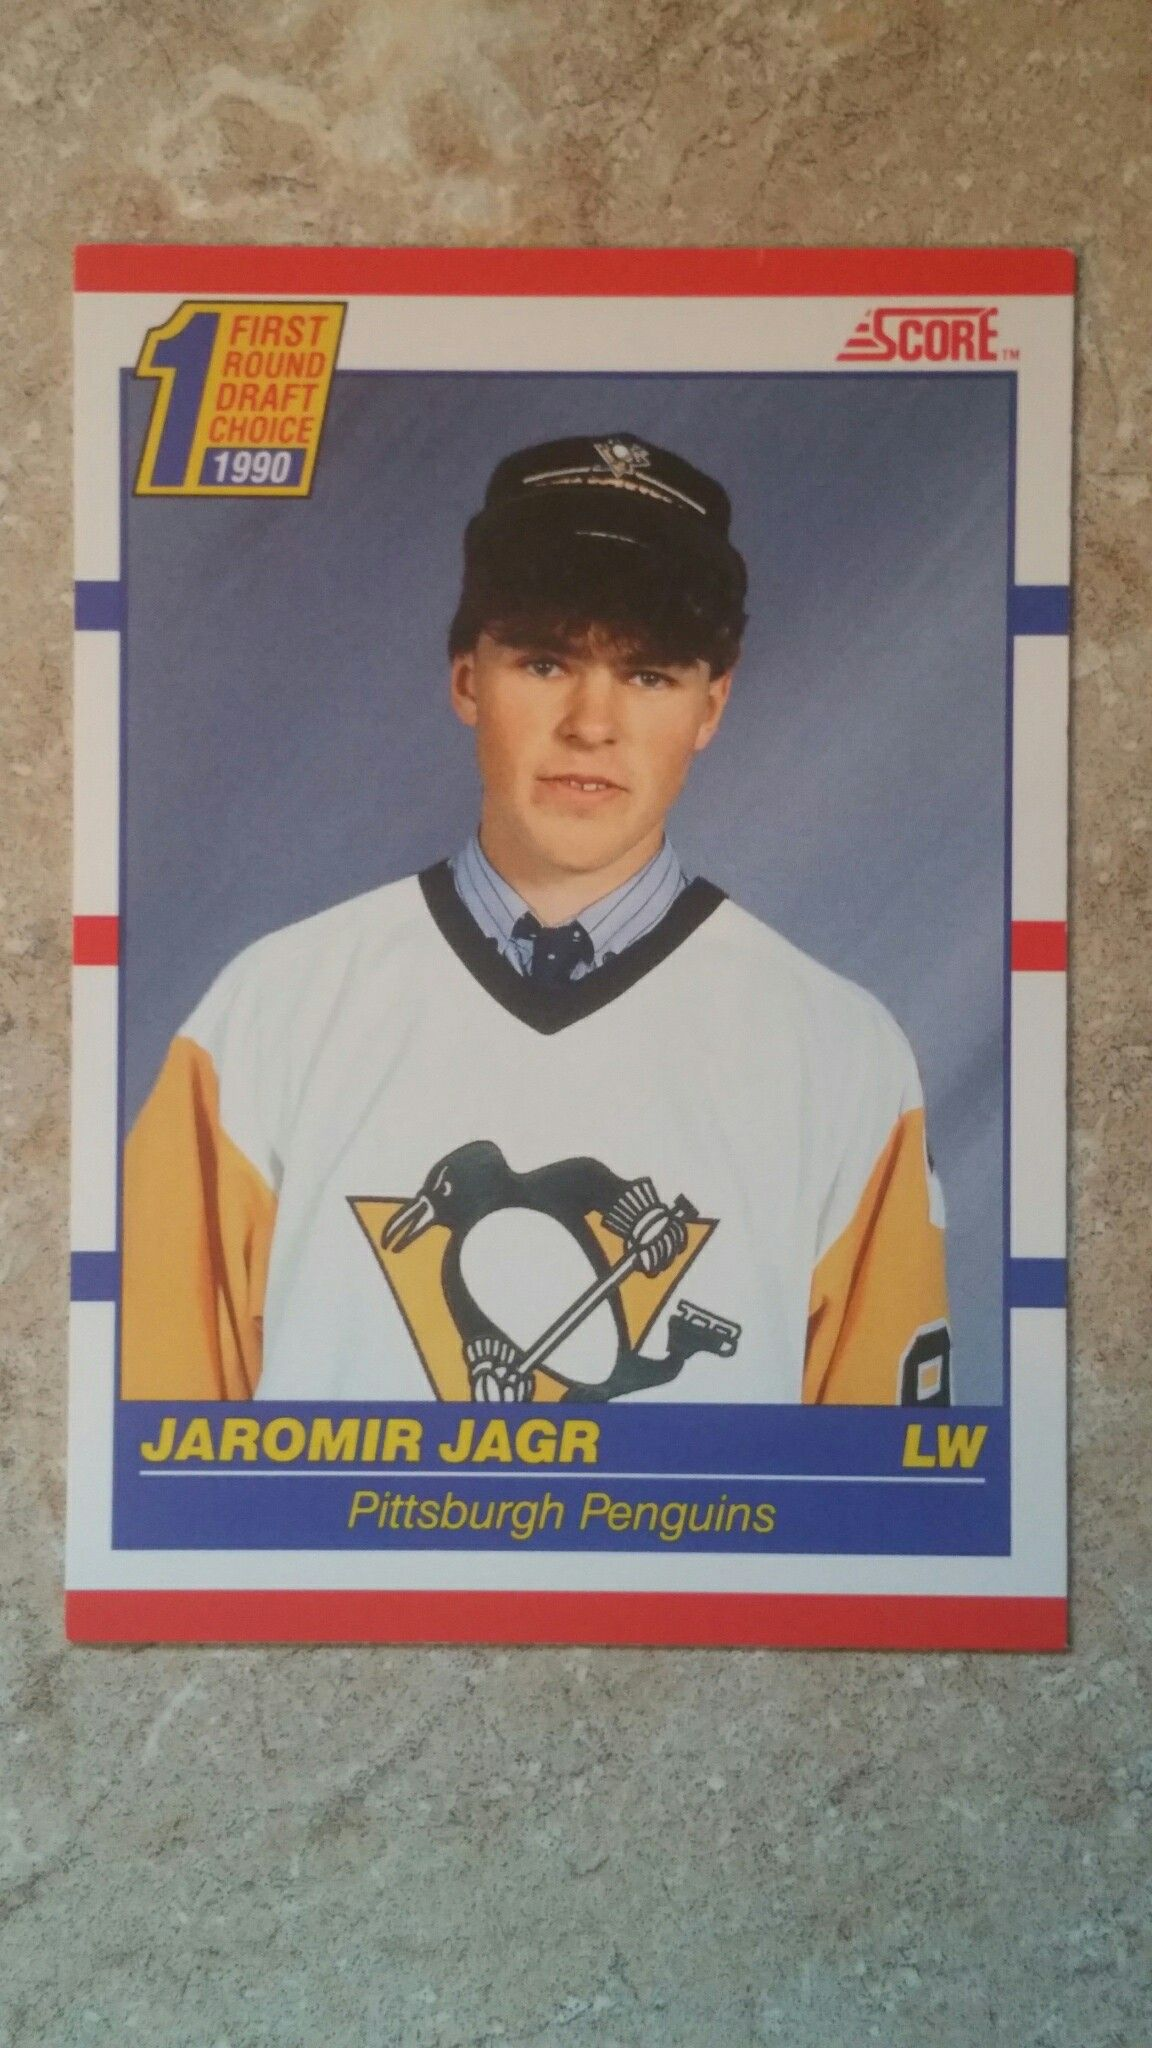 jaromir jagr rookie card score